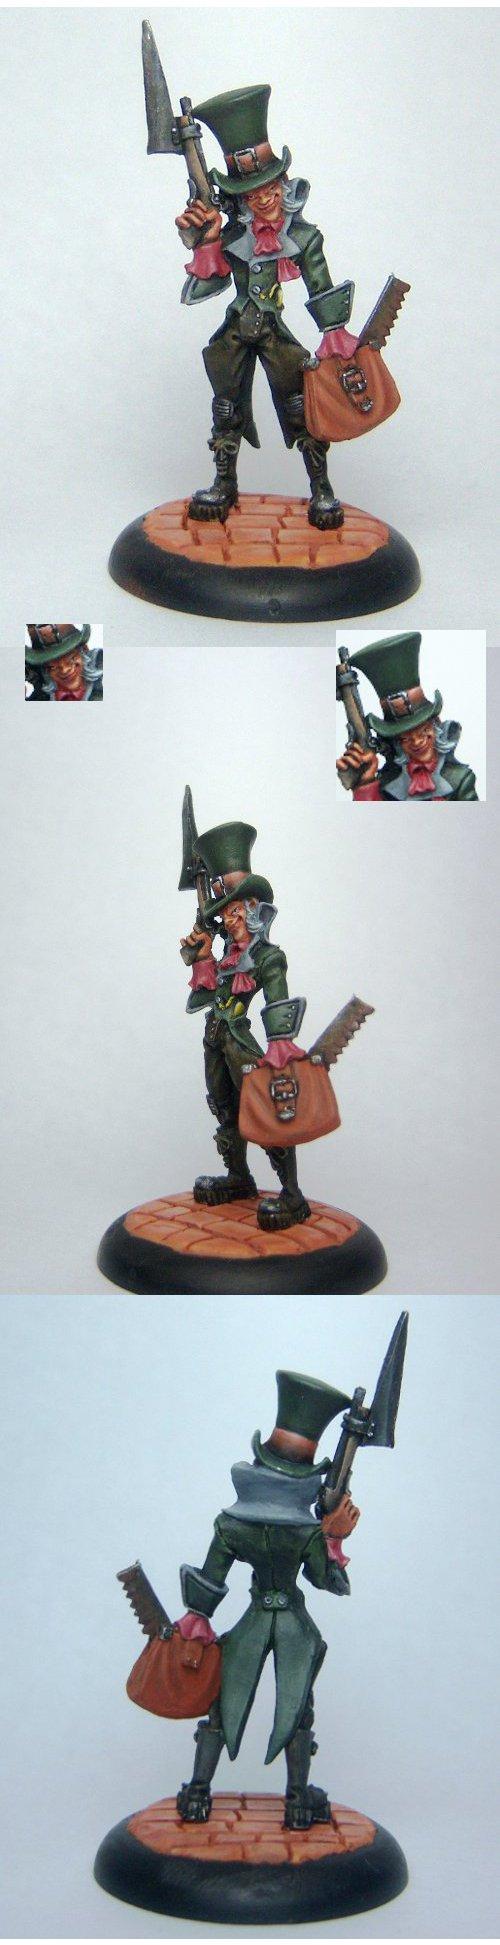 Seamus-The-Mad Hatter